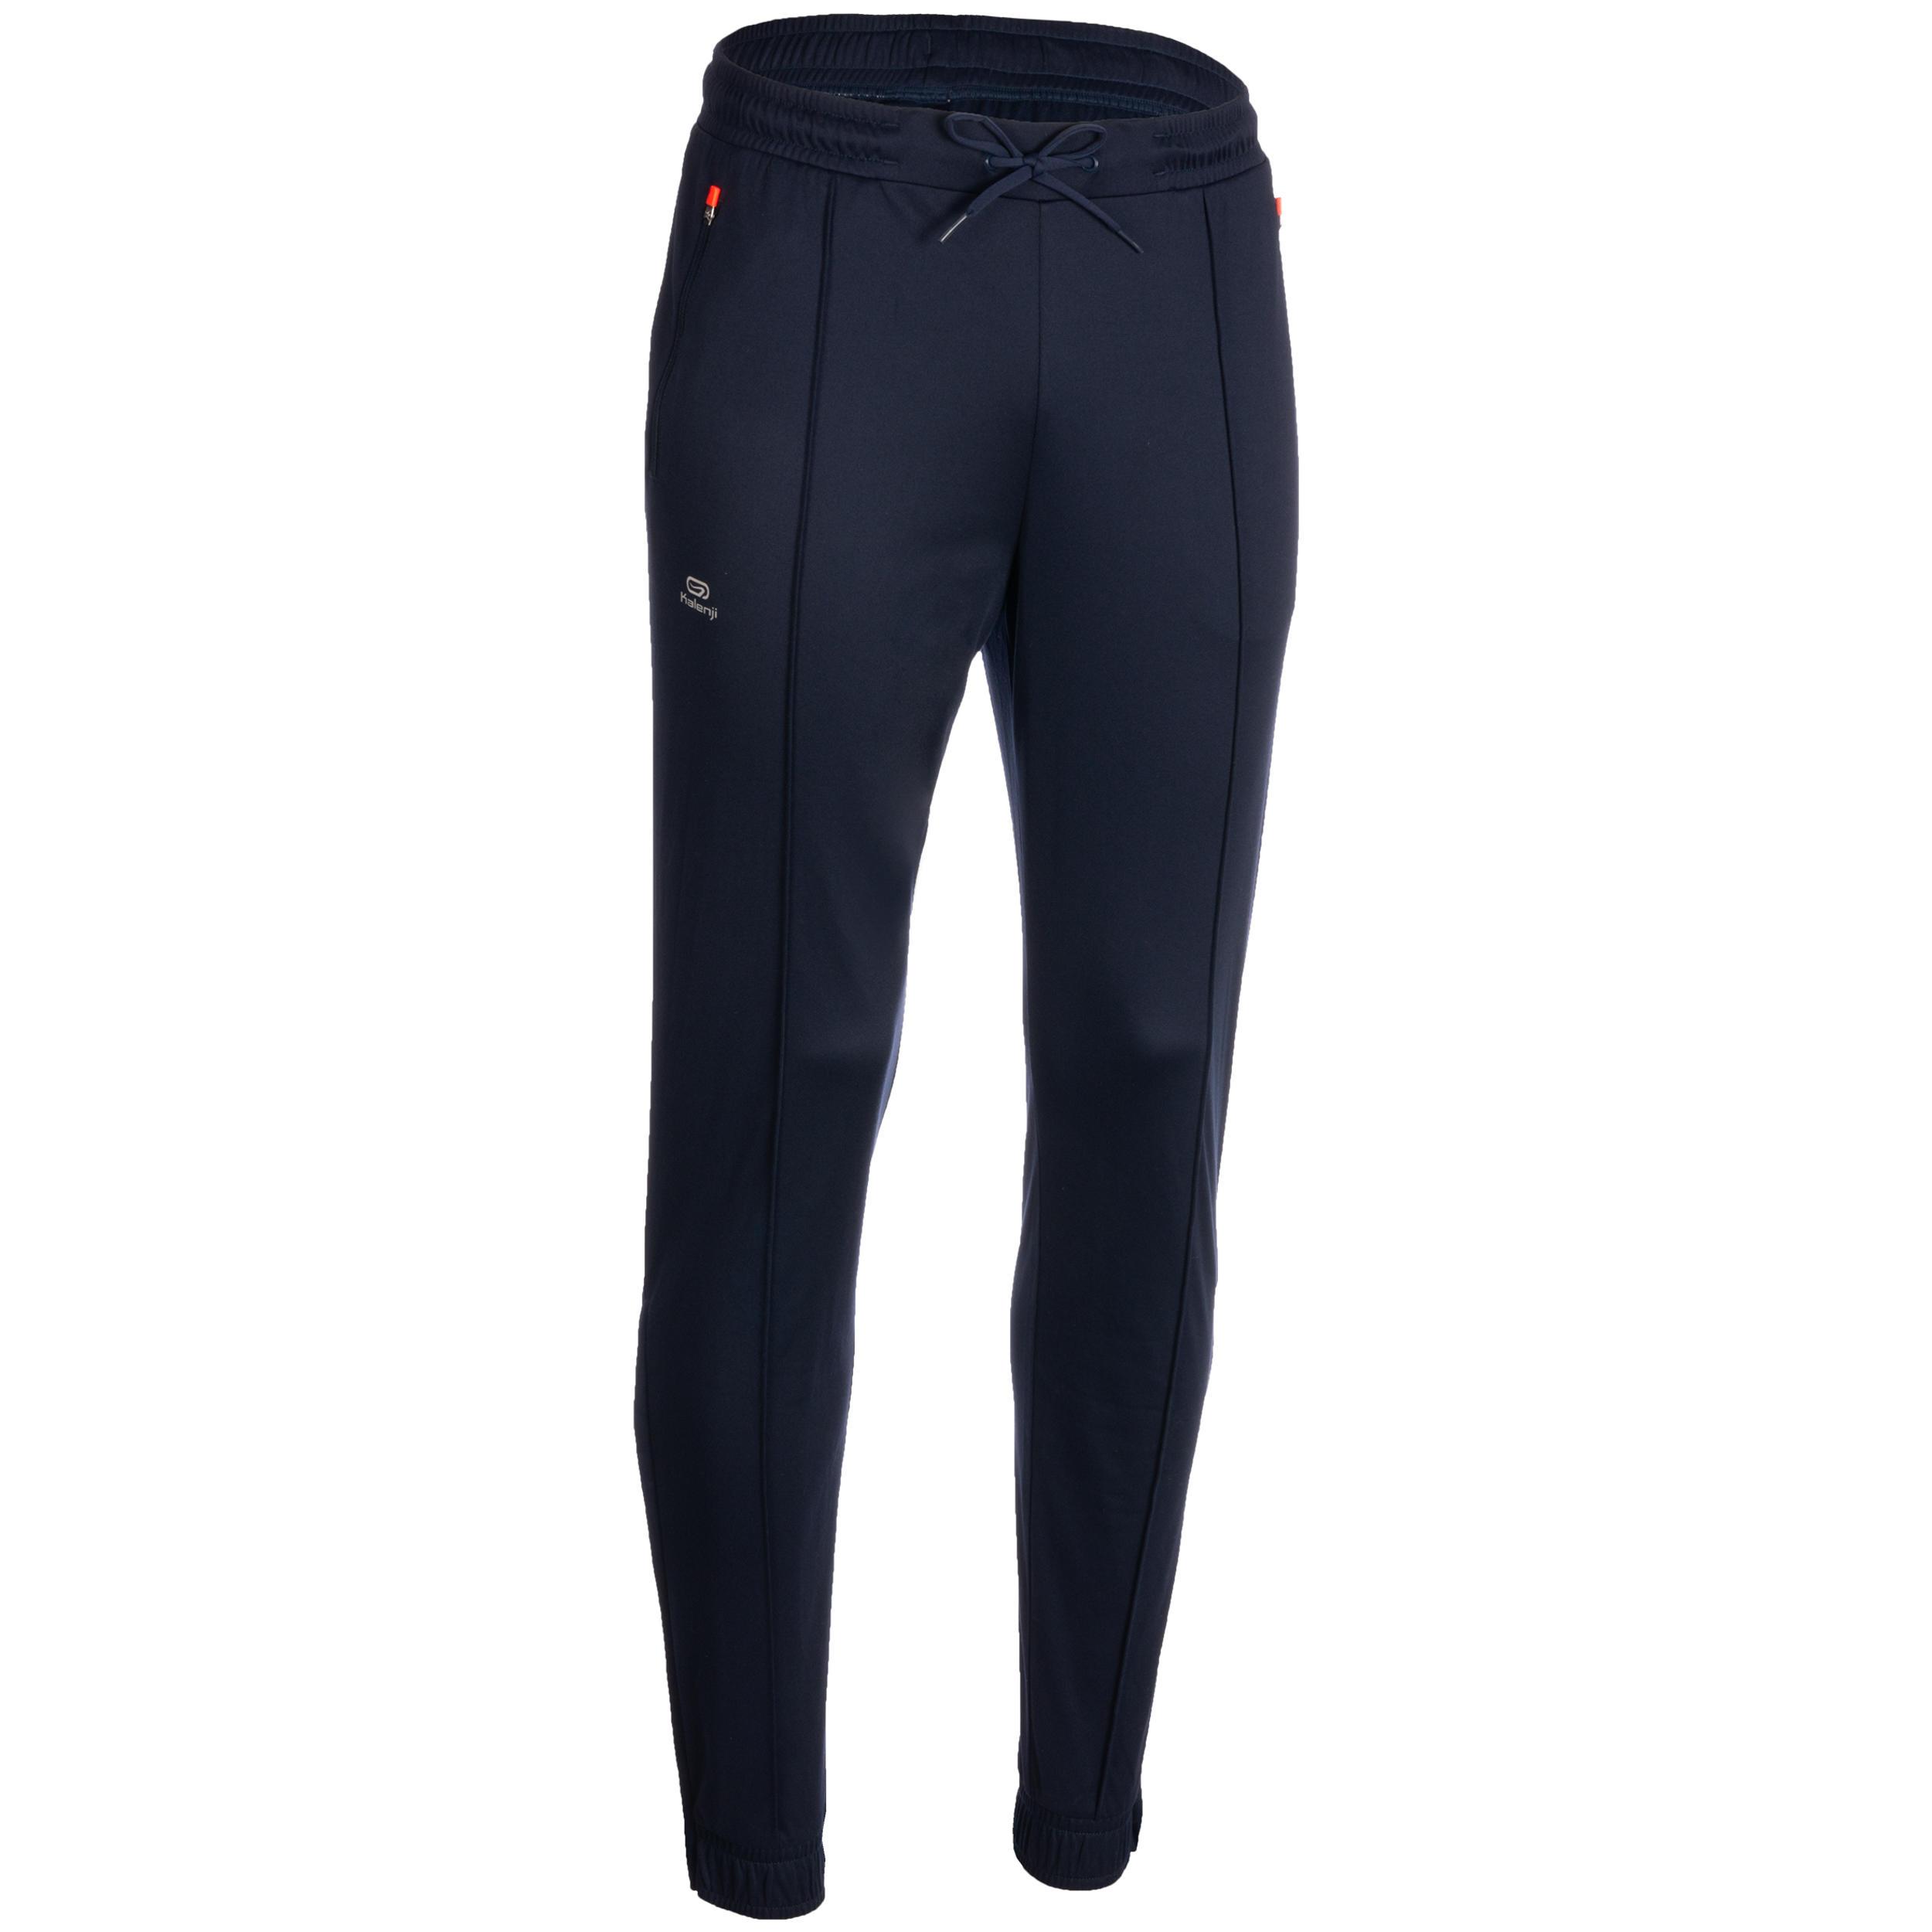 Laufhose lang Herren blau/orange | Sportbekleidung > Sporthosen > Laufhosen | Kalenji